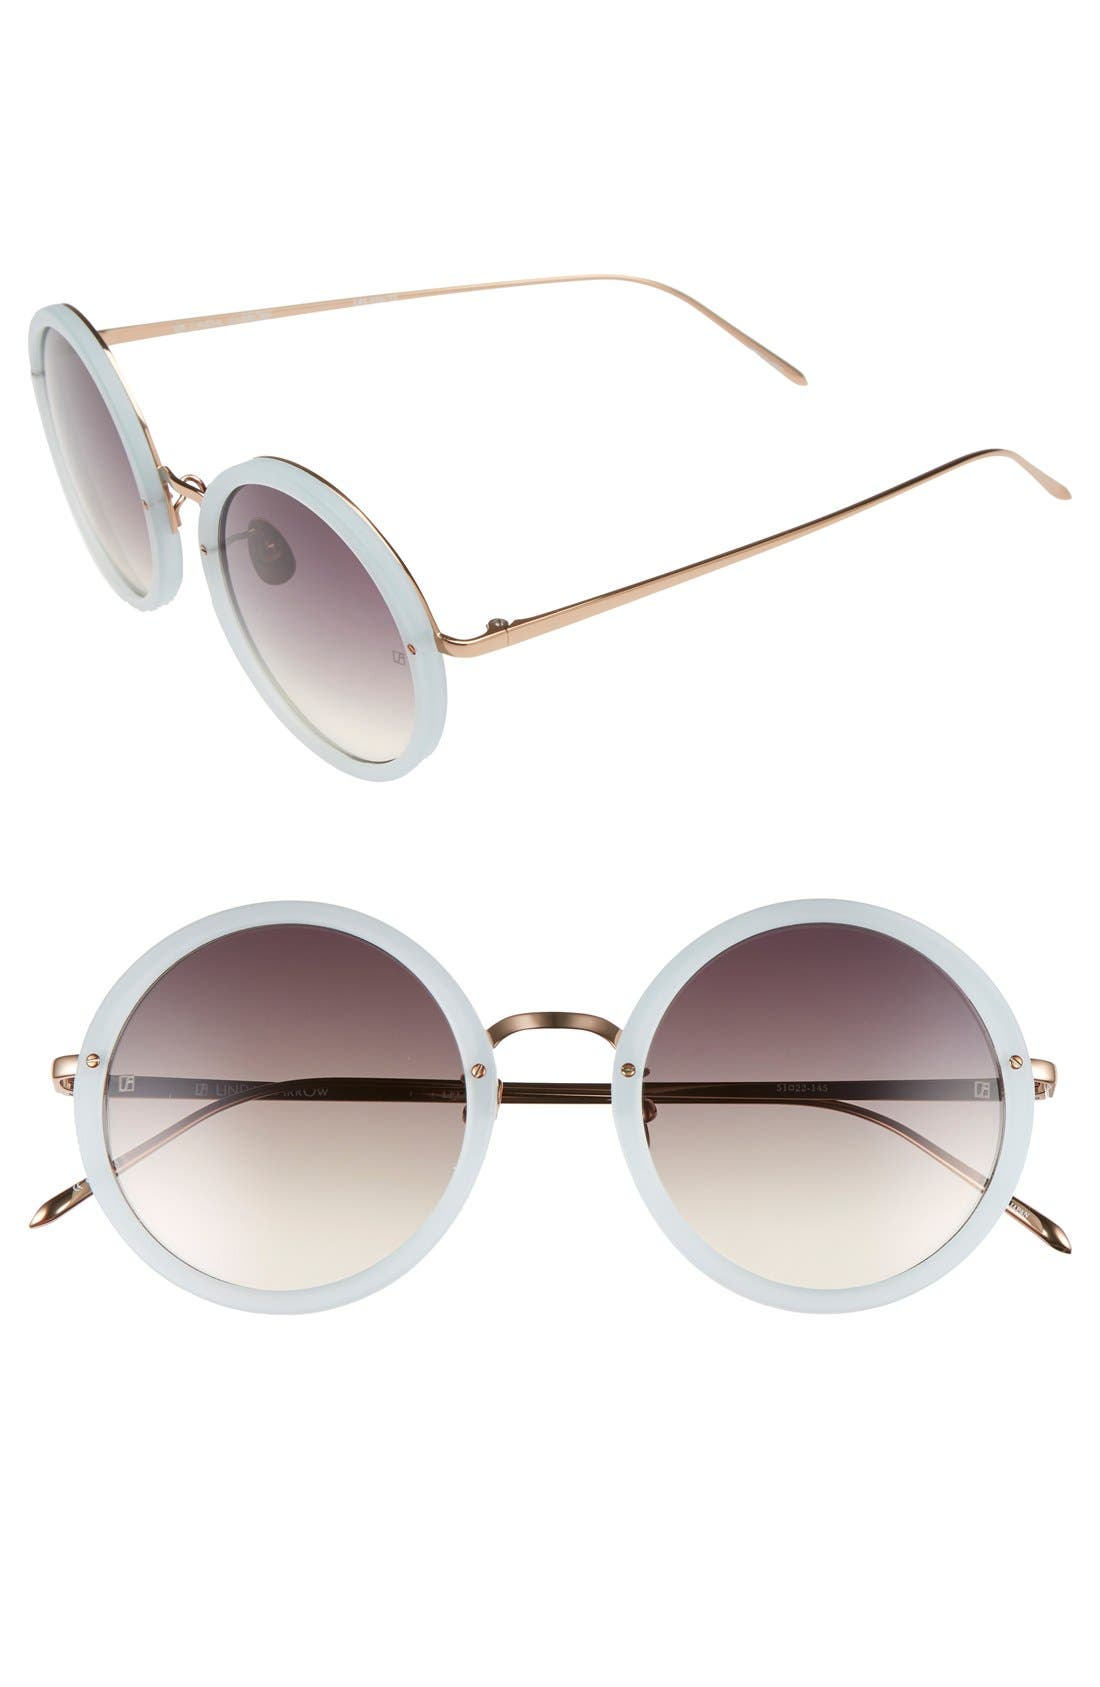 51mm Round 18 Karat Rose Gold Sunglasses,                             Main thumbnail 1, color,